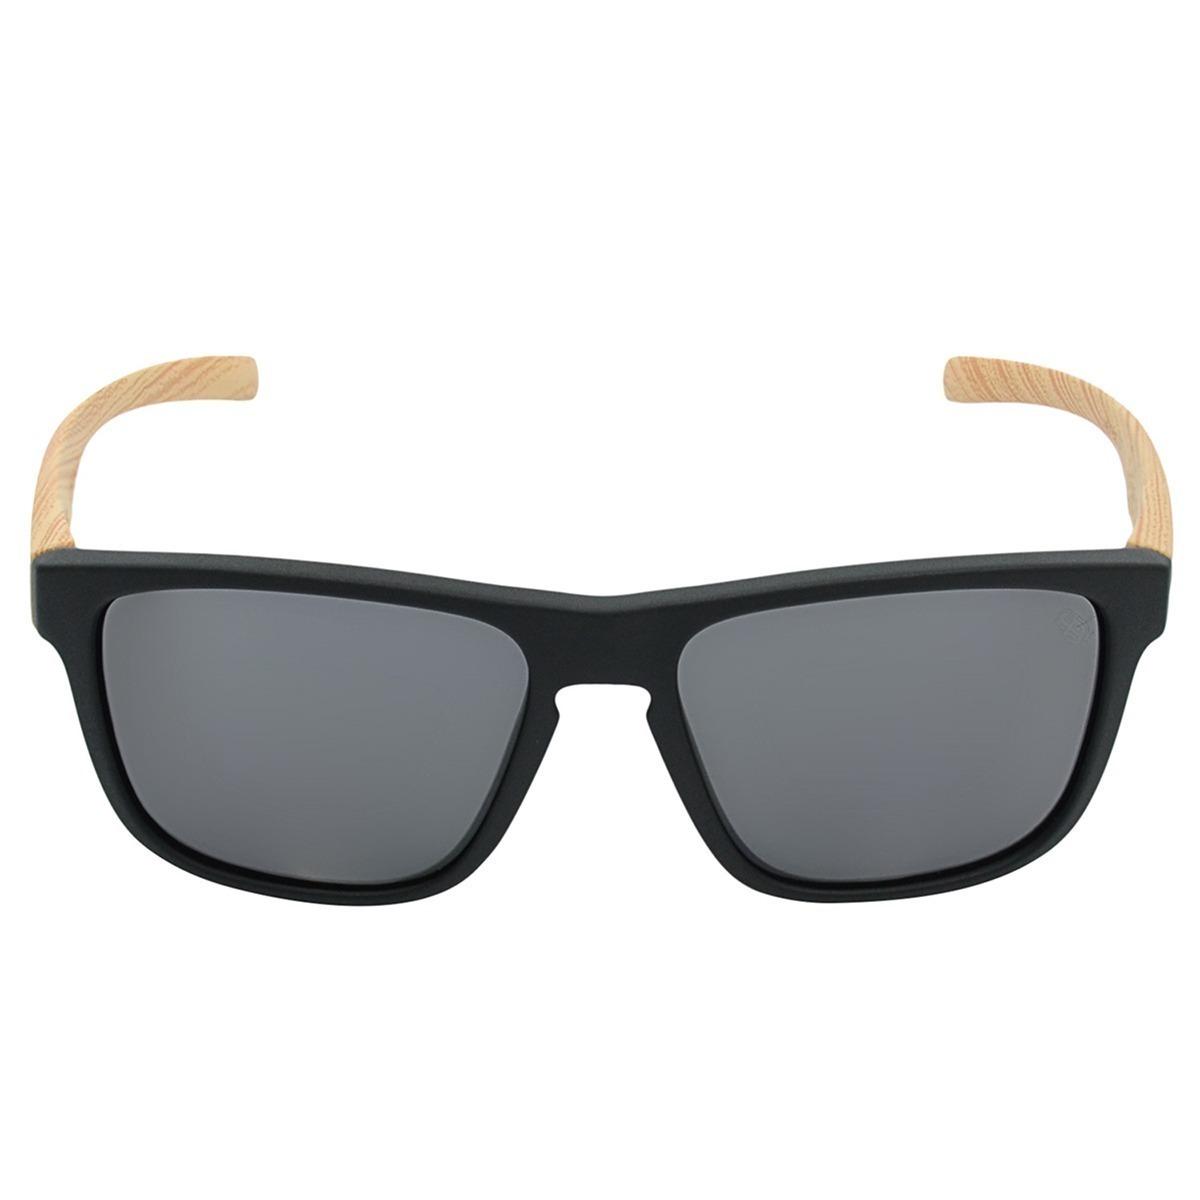 oculos sol masculino hb h-bomb original preto madeira wood. Carregando zoom. 09ecb8b1dd